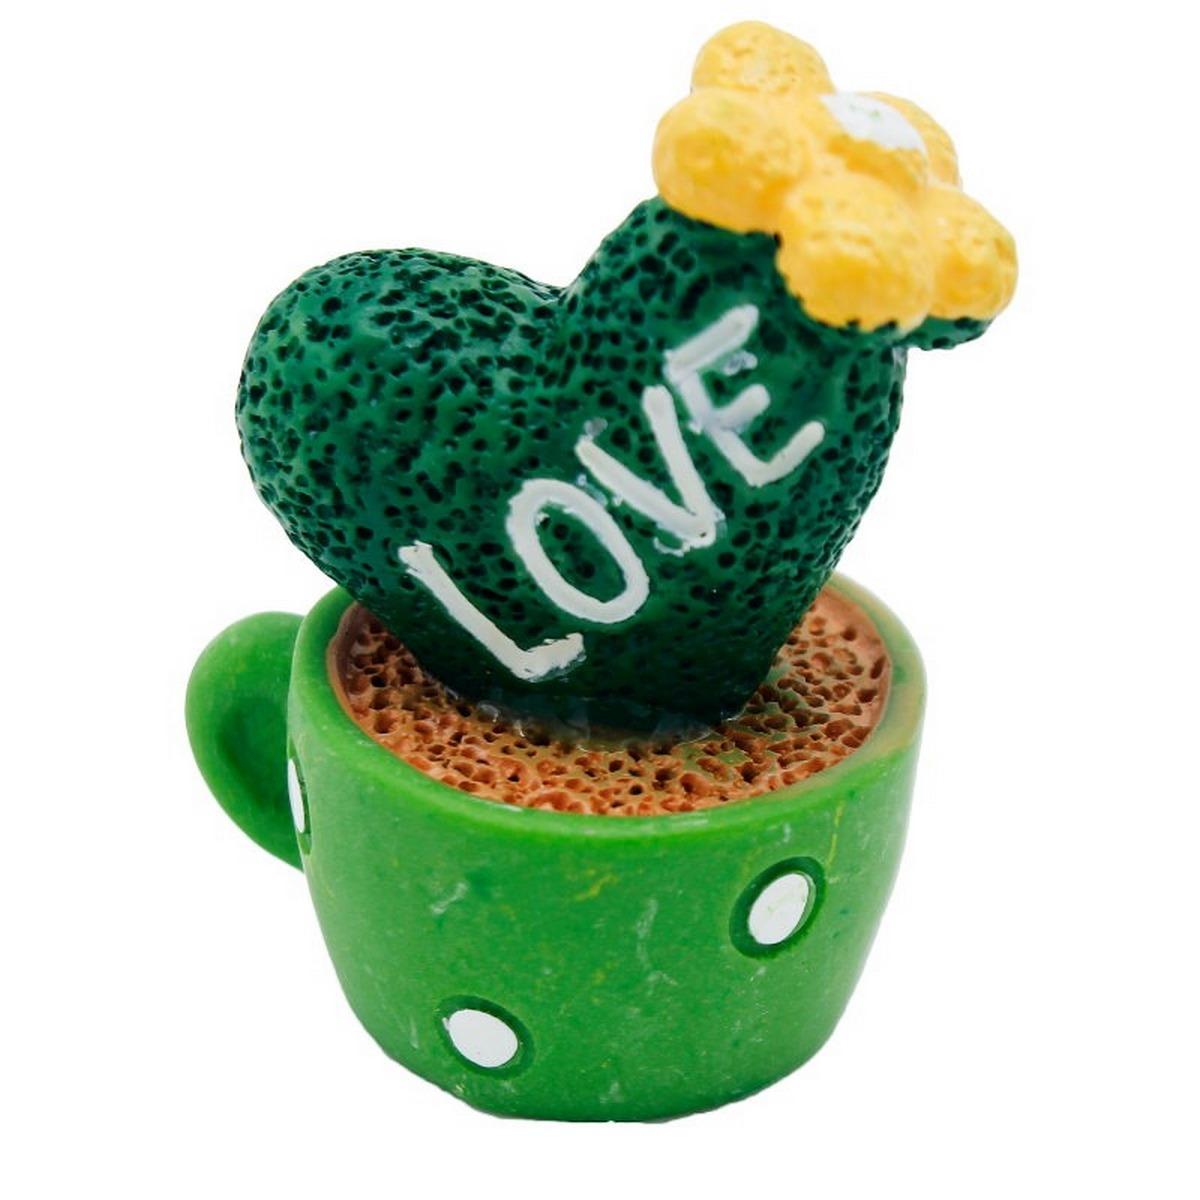 Miniature Plant Cup